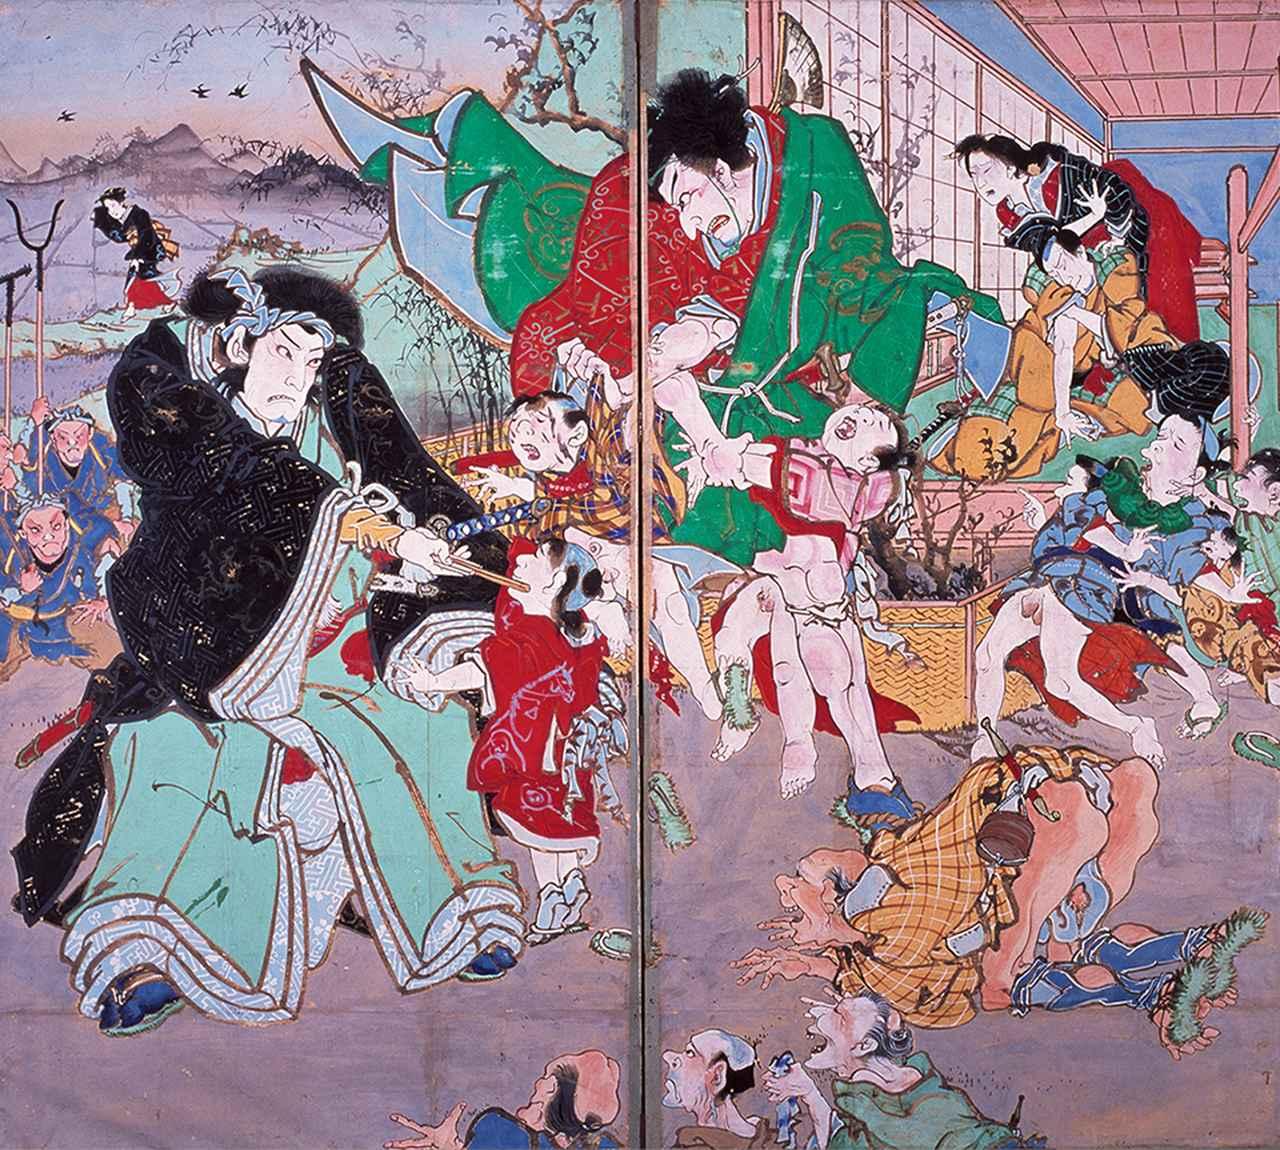 Images : 10番目の画像 - 「画家ヒグチユウコの 世界をつくるもの」のアルバム - T JAPAN:The New York Times Style Magazine 公式サイト